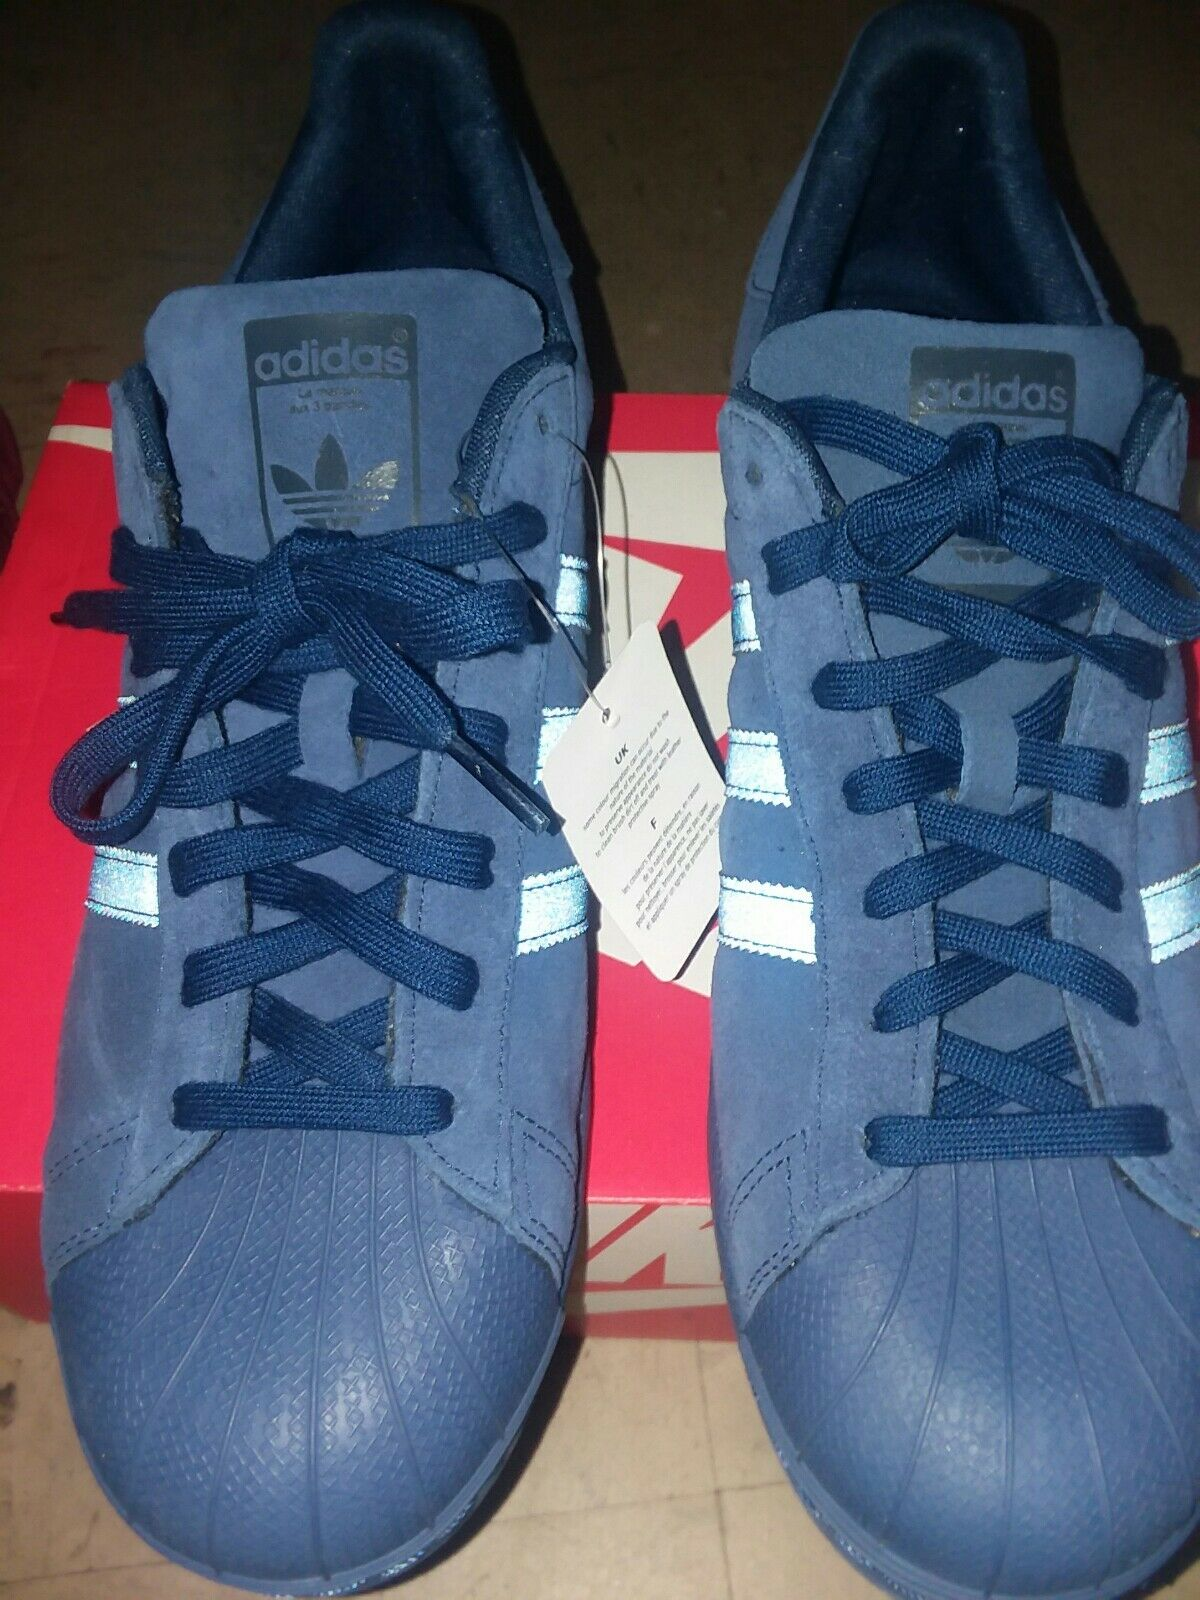 Adidas Originals 3M Superstar Size 13 Men's BB8122 Navy bluee Suede 3M Sneakers